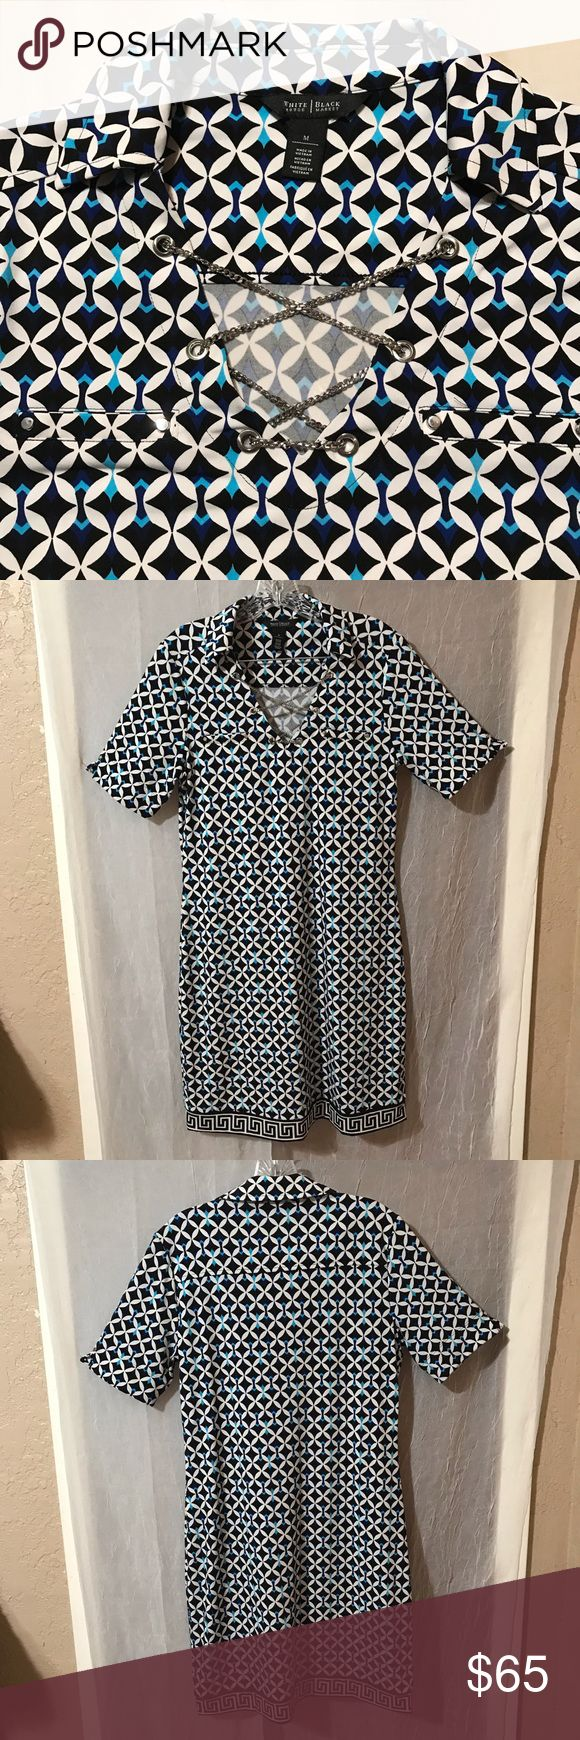 WHBM Collard Caged V Neck Diamond Print Dress SZ M White House Black Market Coll…